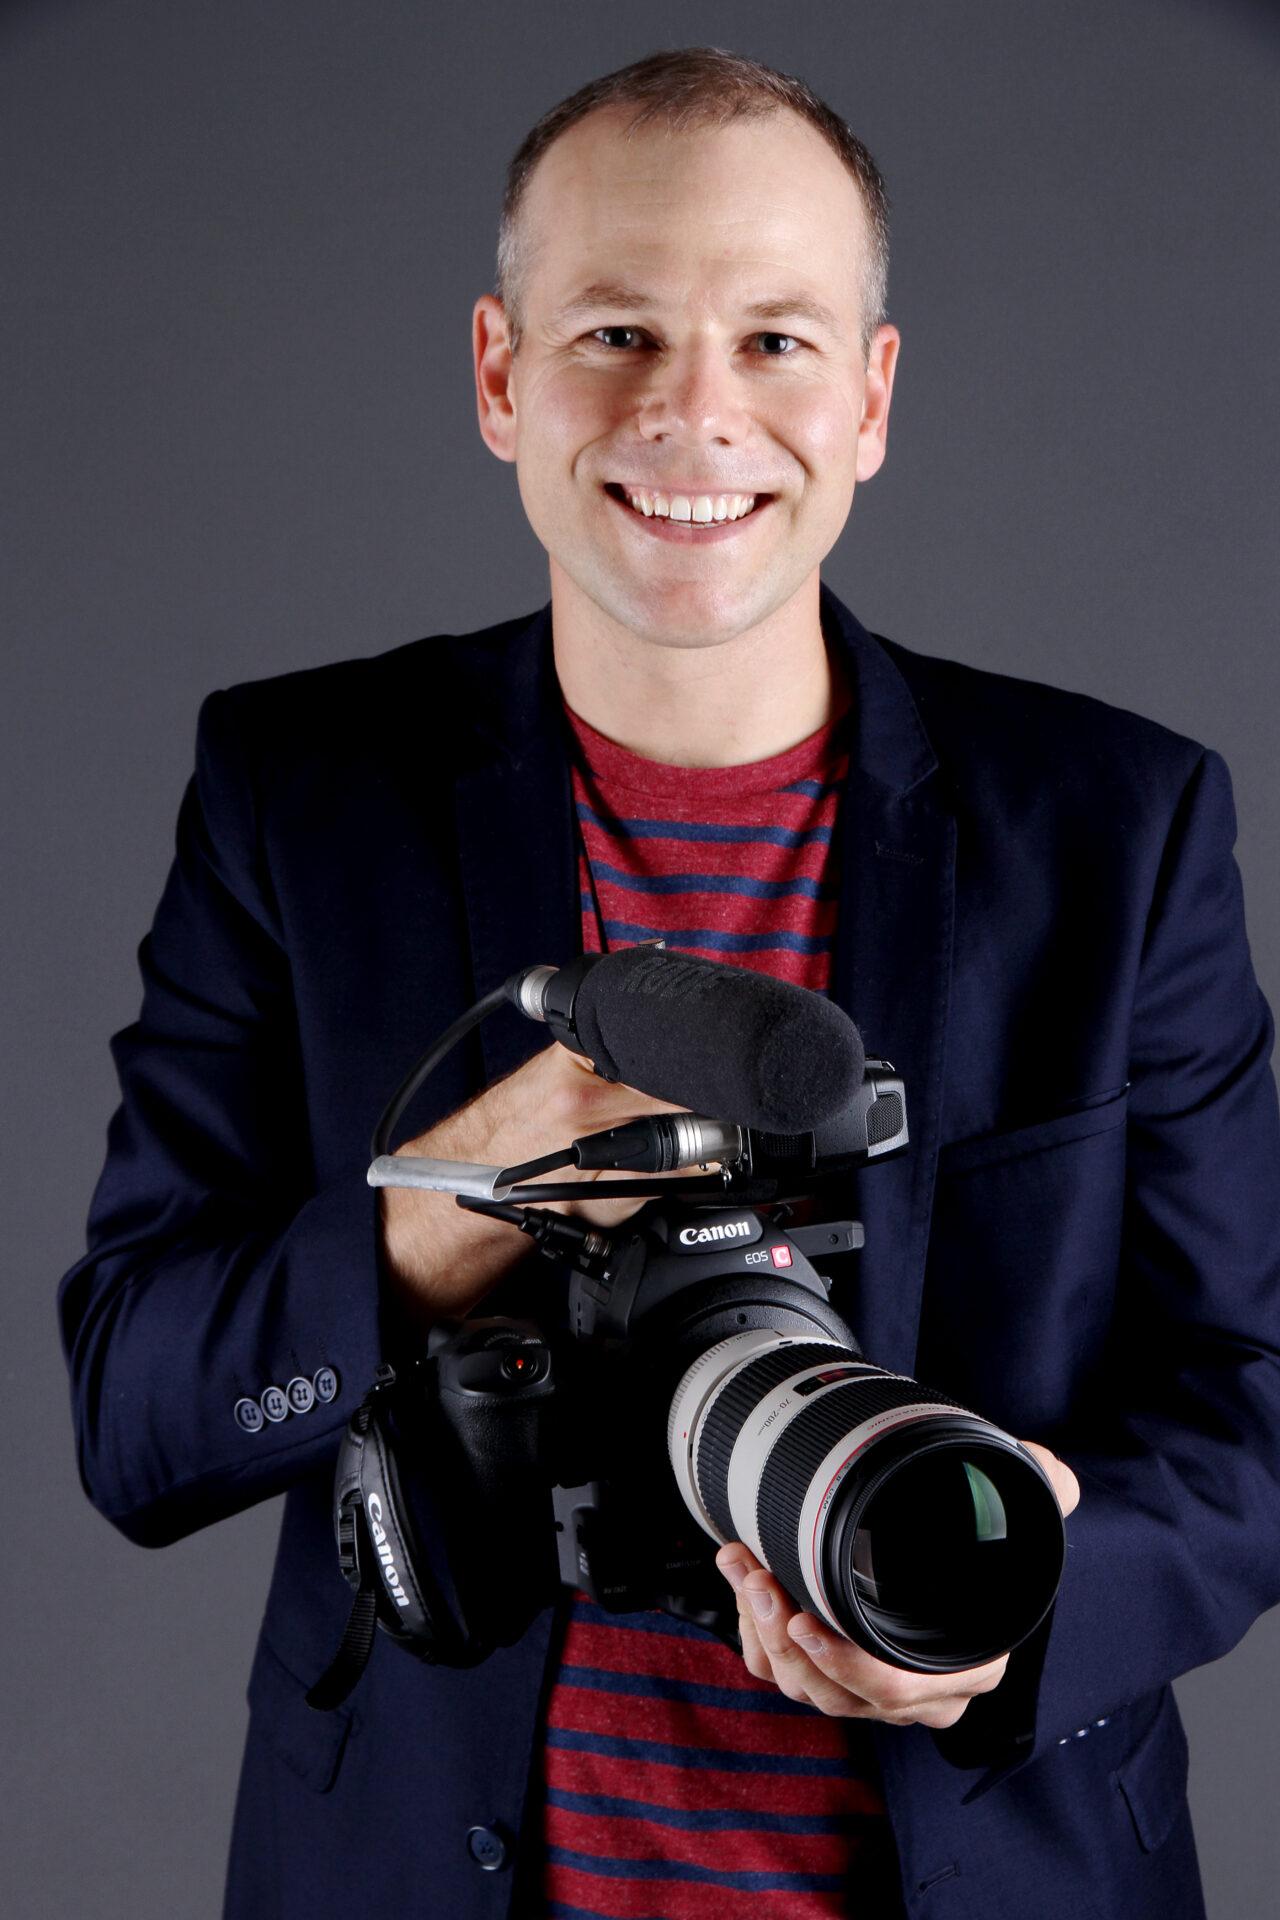 Le réalisateur Yves Charron